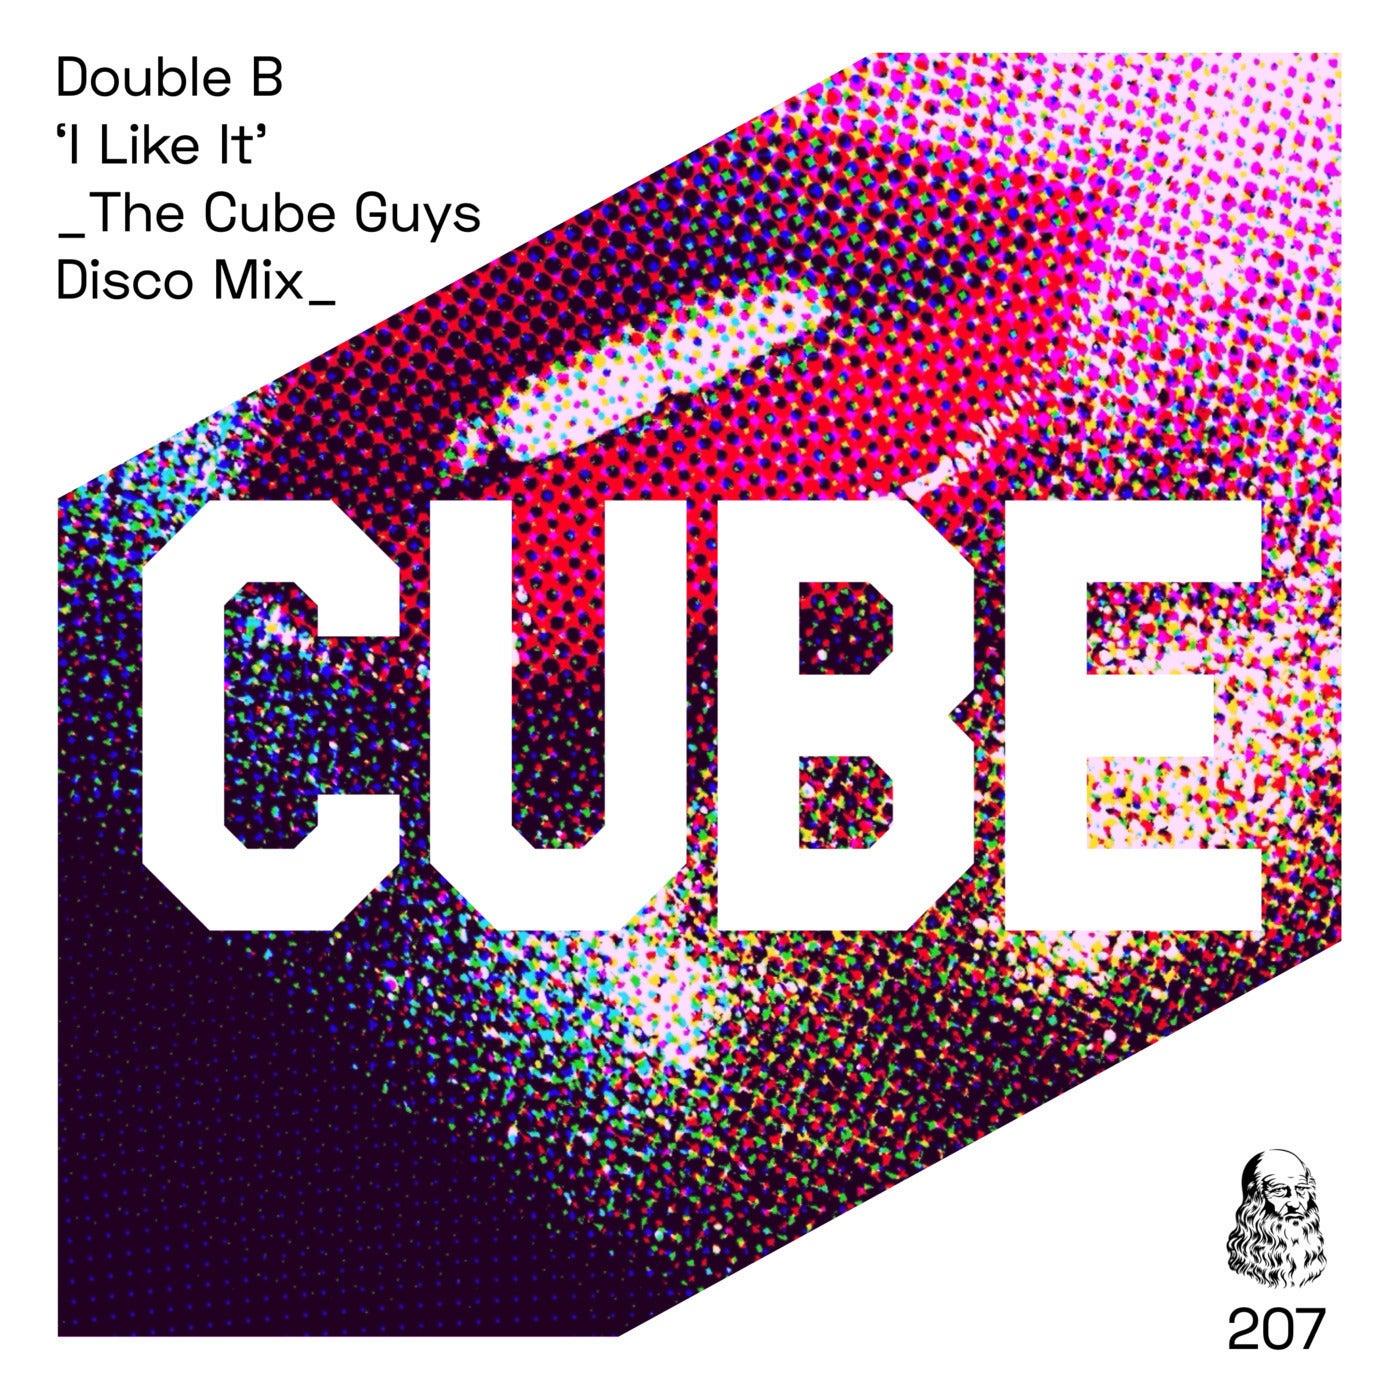 I Like It (The Cube Guys Disco Mix)